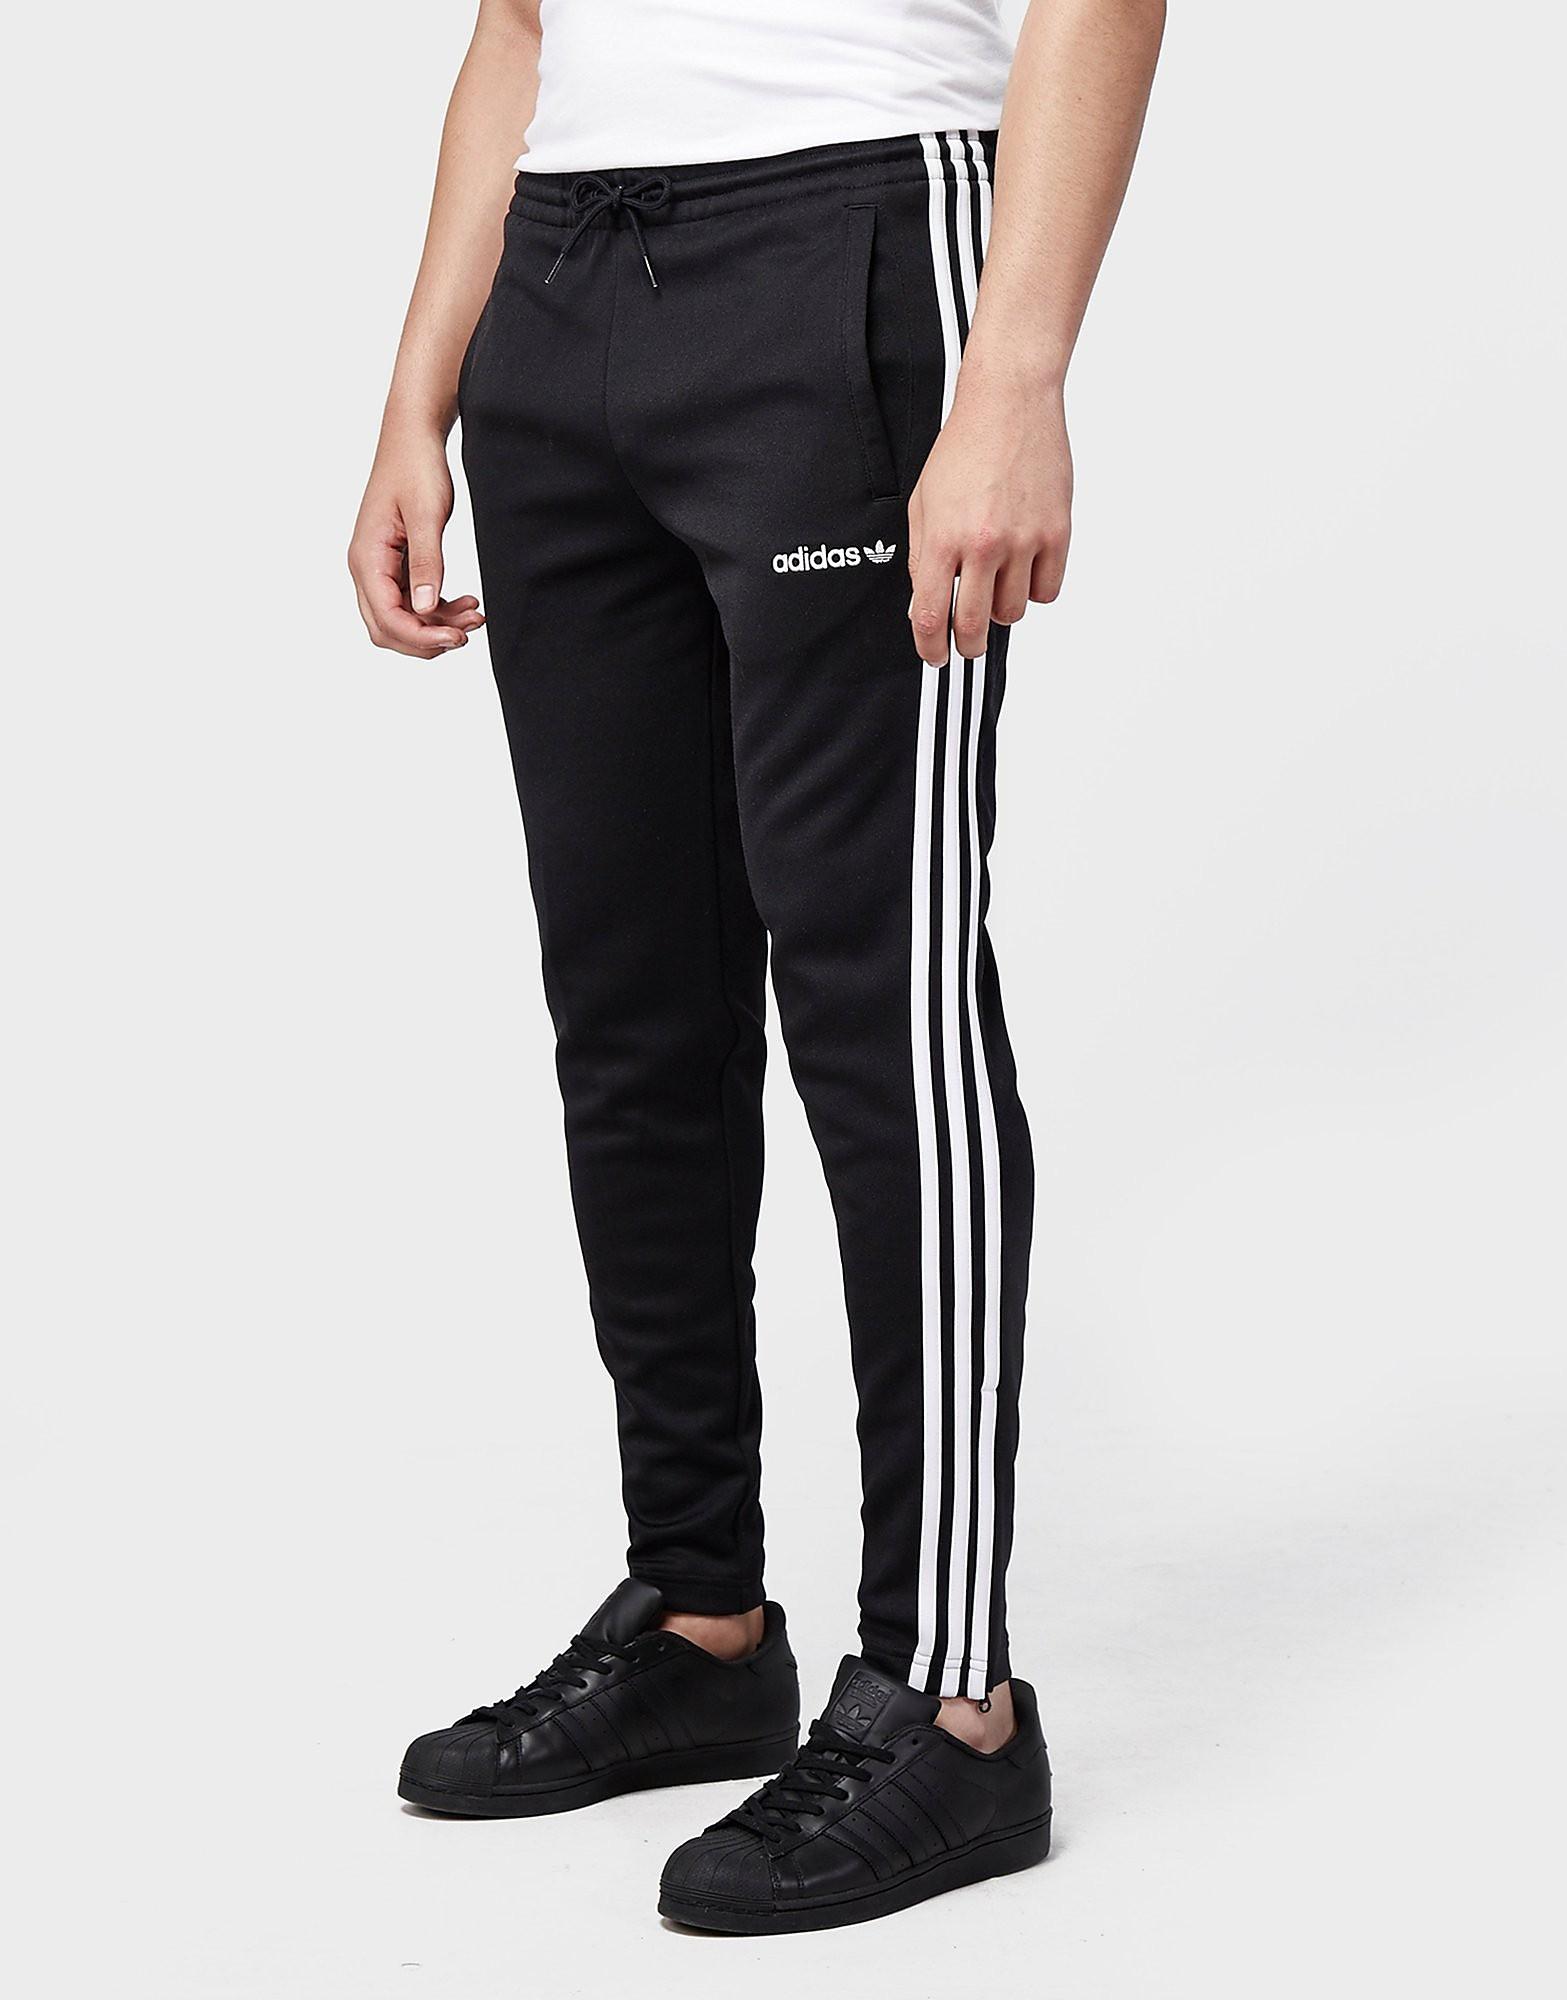 adidas Originals Itasca Track Pants  Black Black